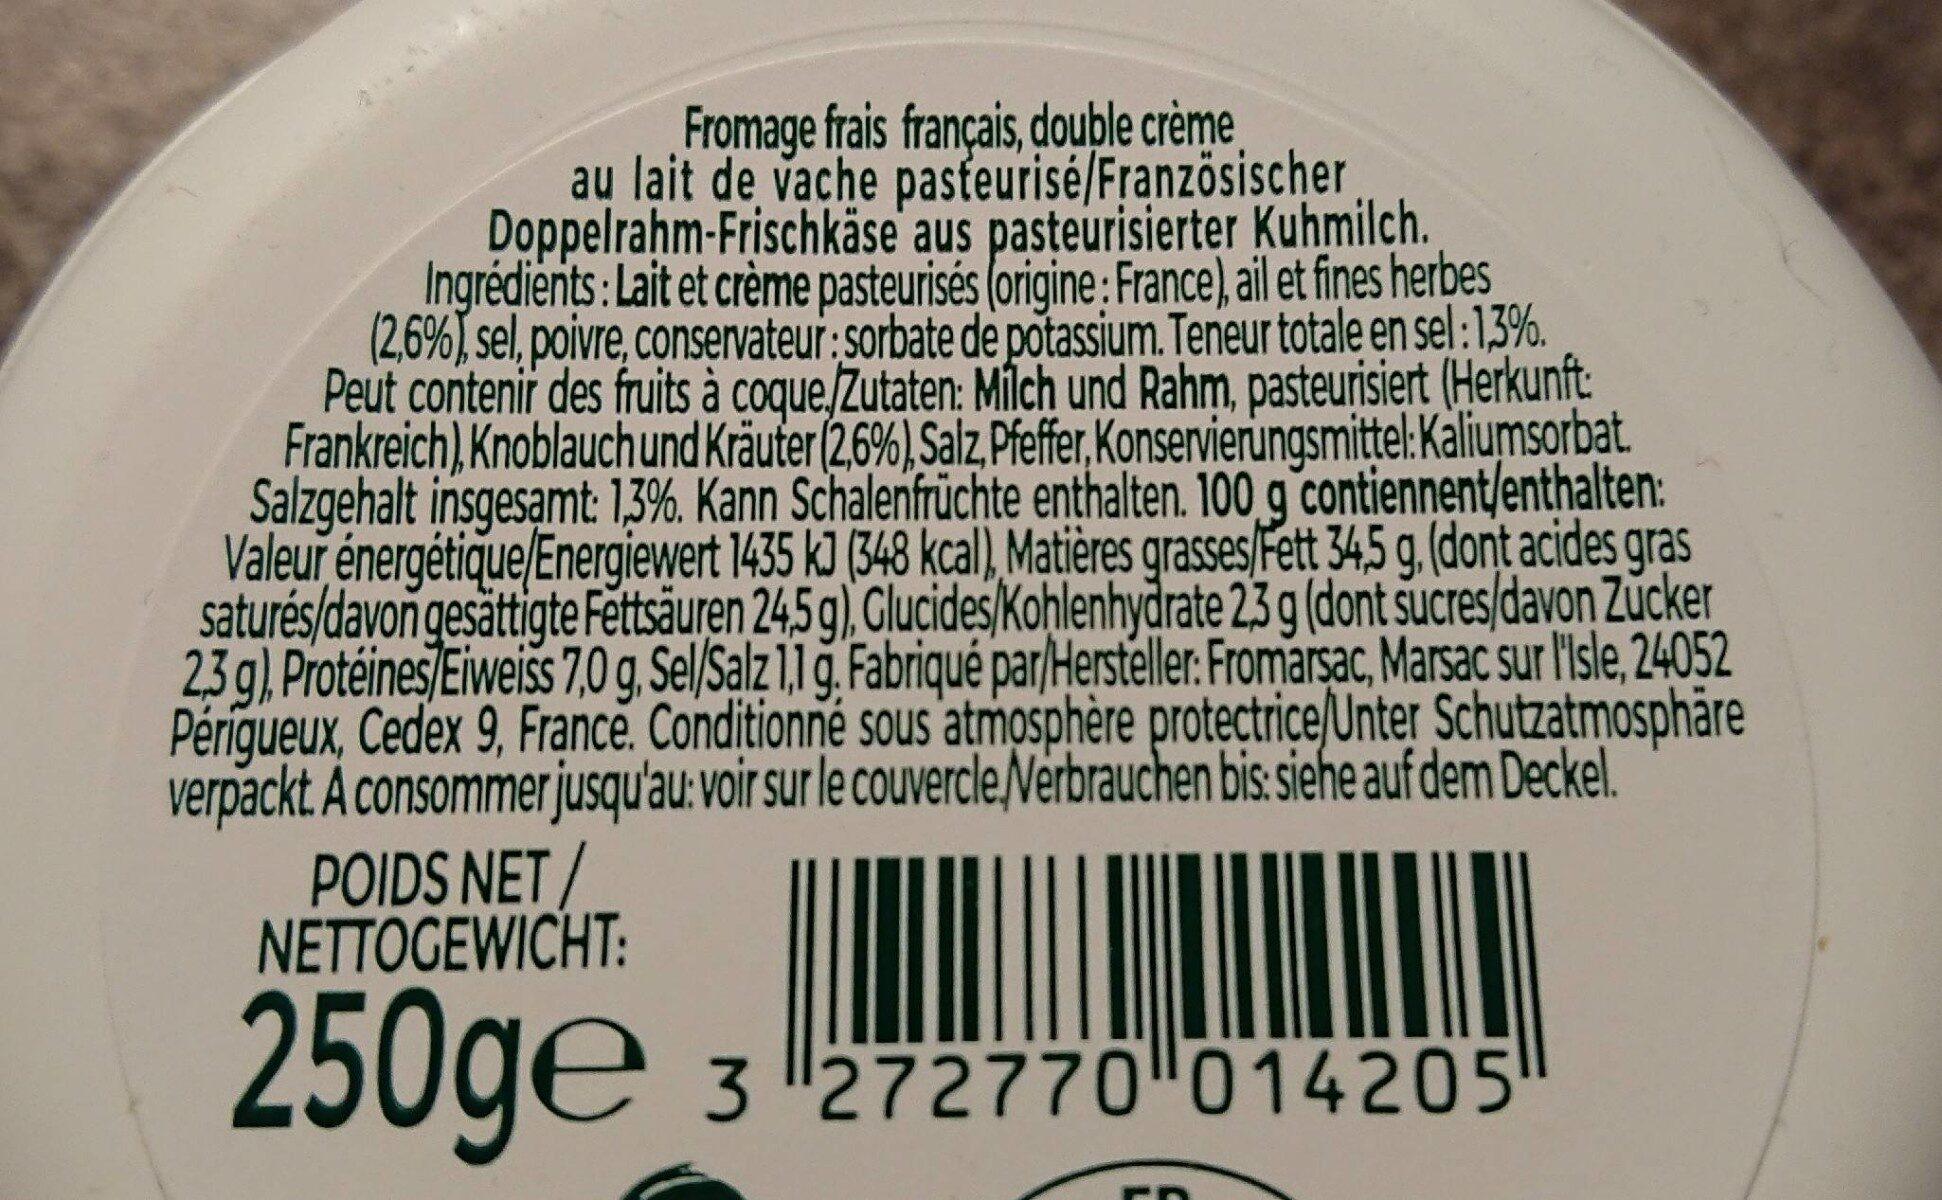 Tartare Ail et Fines Herbes - Informations nutritionnelles - fr